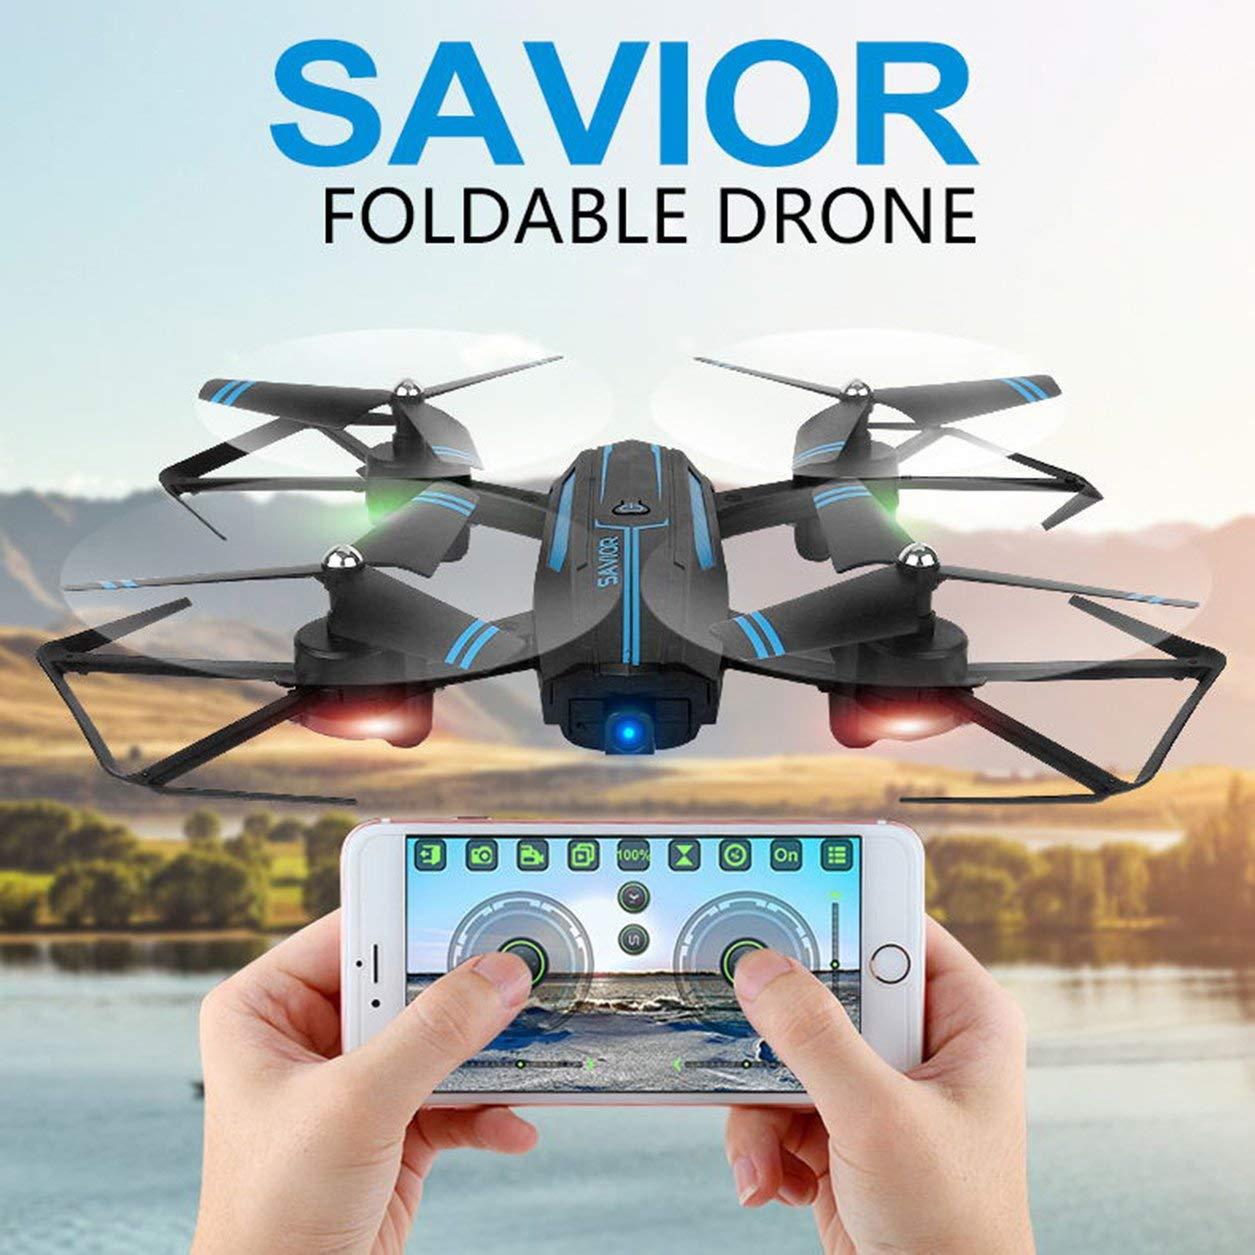 Dailyinshop Folding Drone 720P Kamera-APP Fern WiFi Höhe Quadcopter pflegen